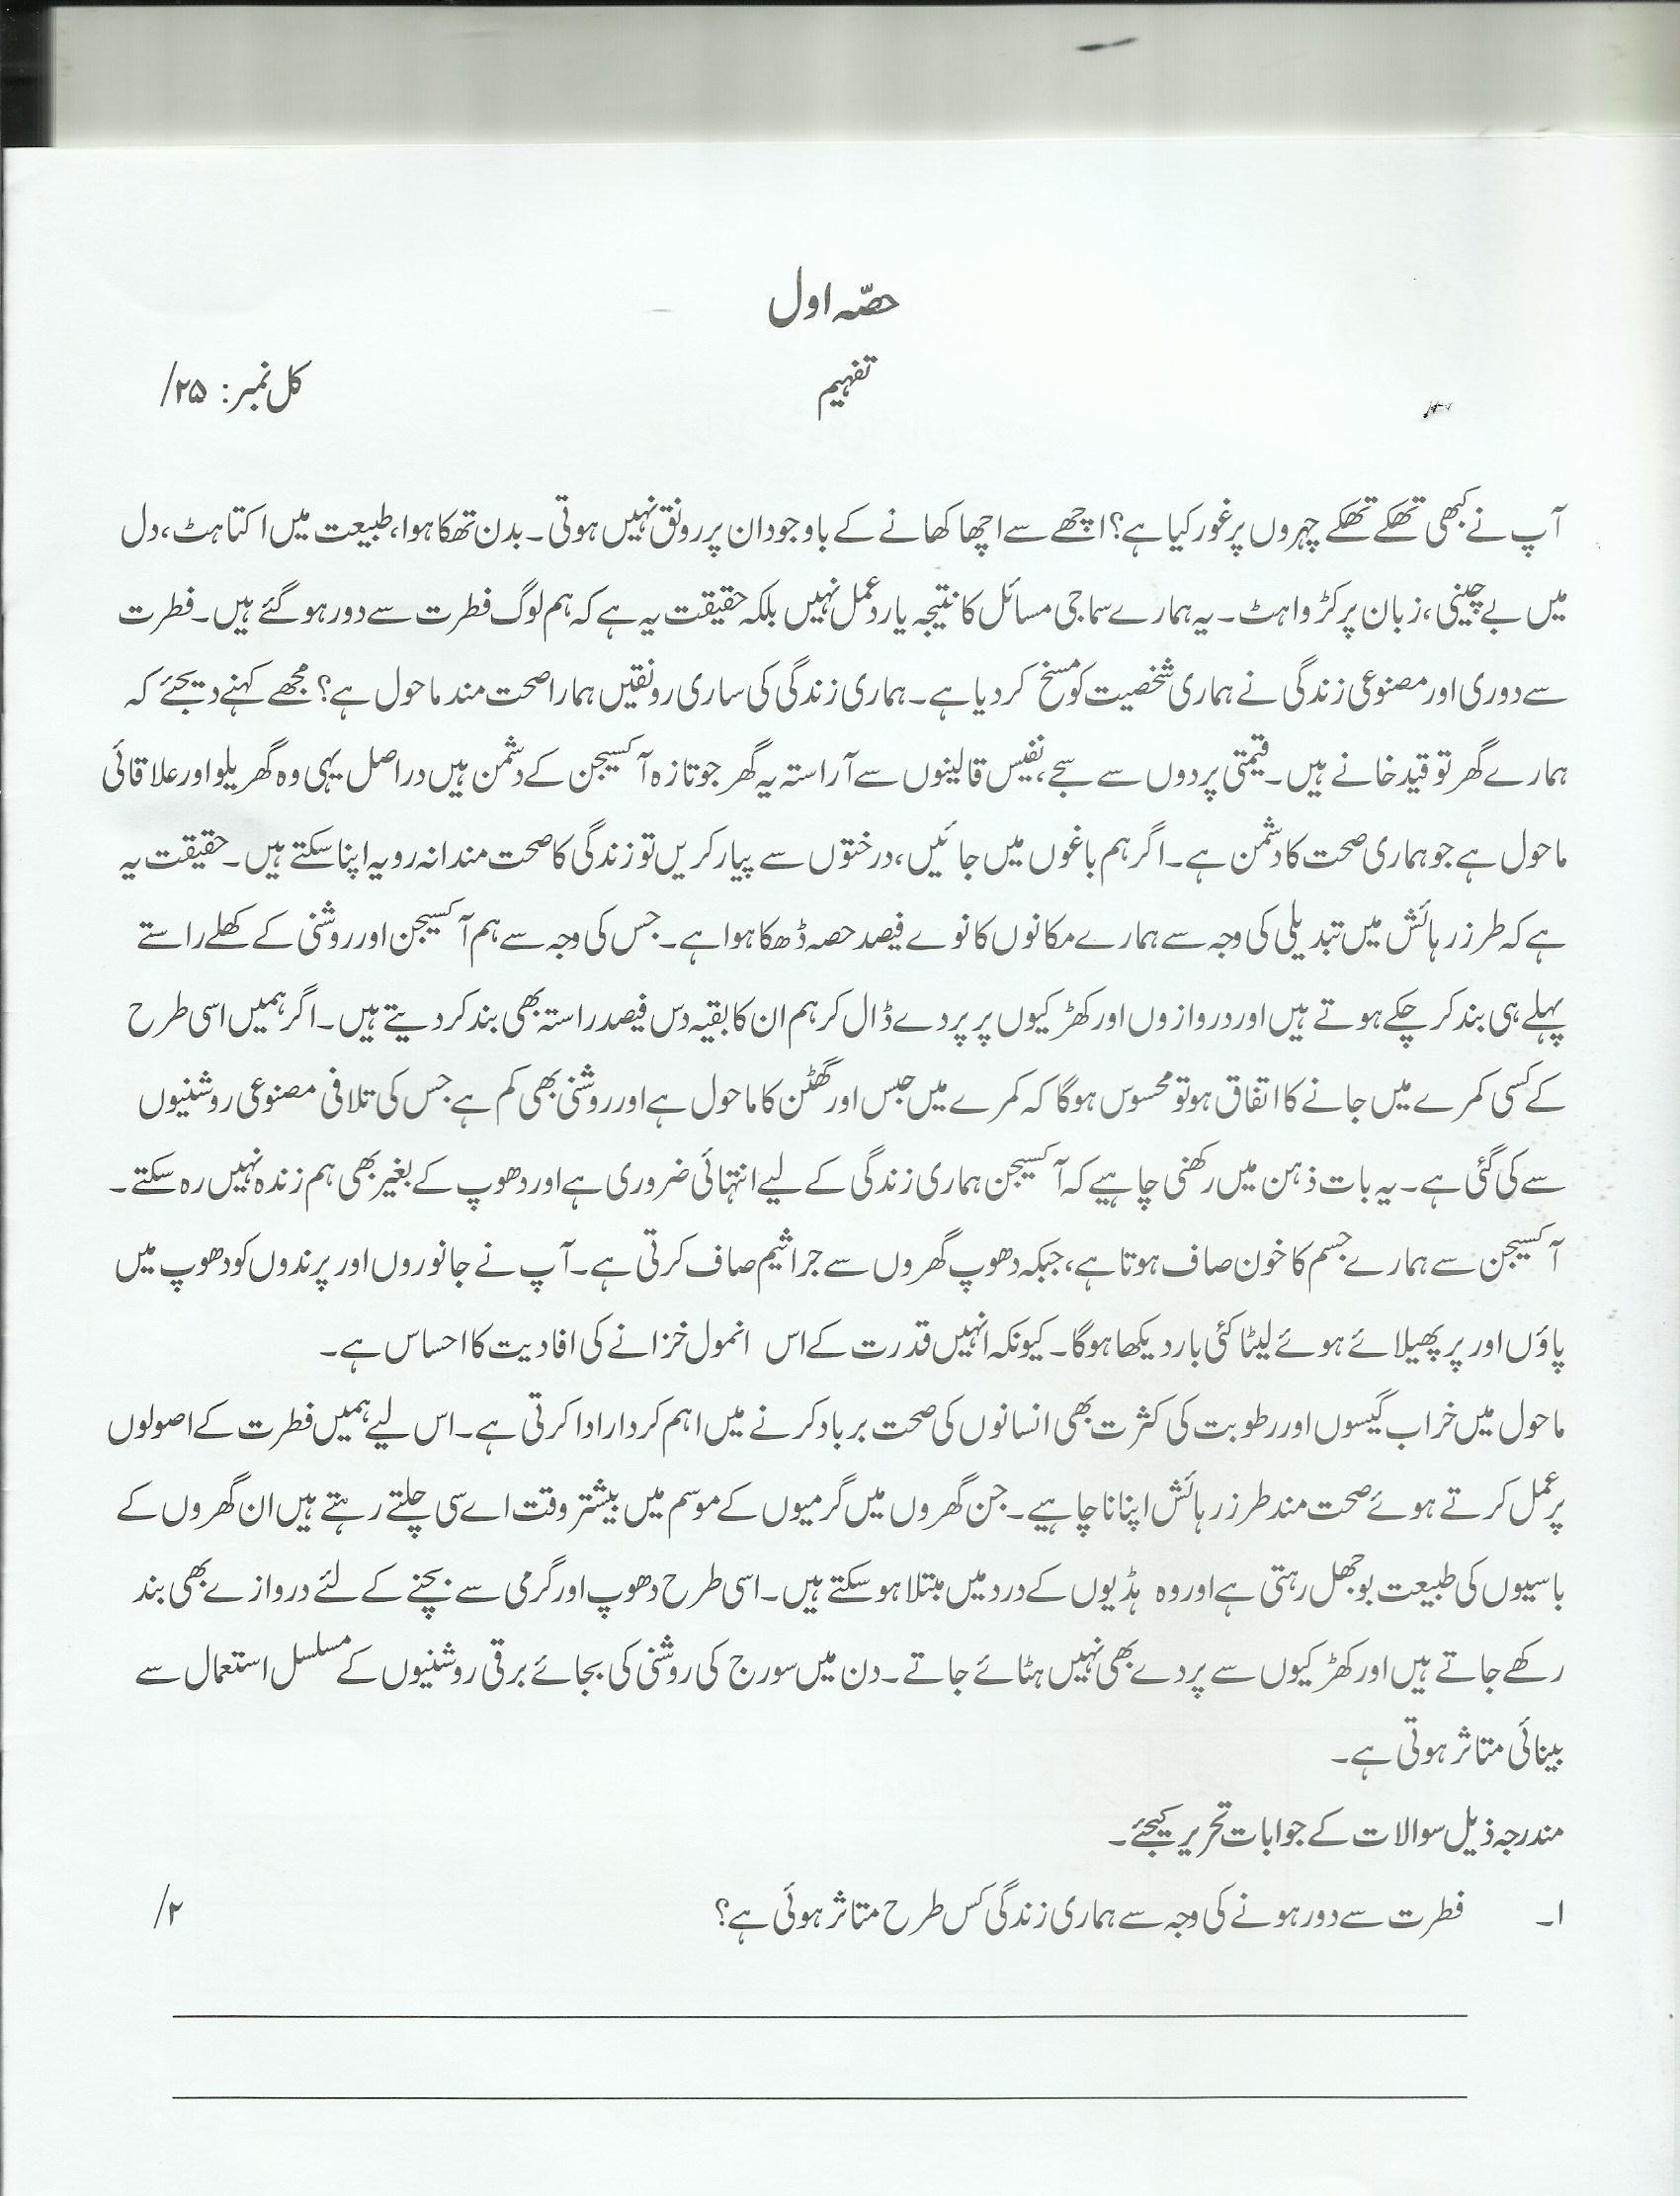 Urdu Worksheet For Class 7